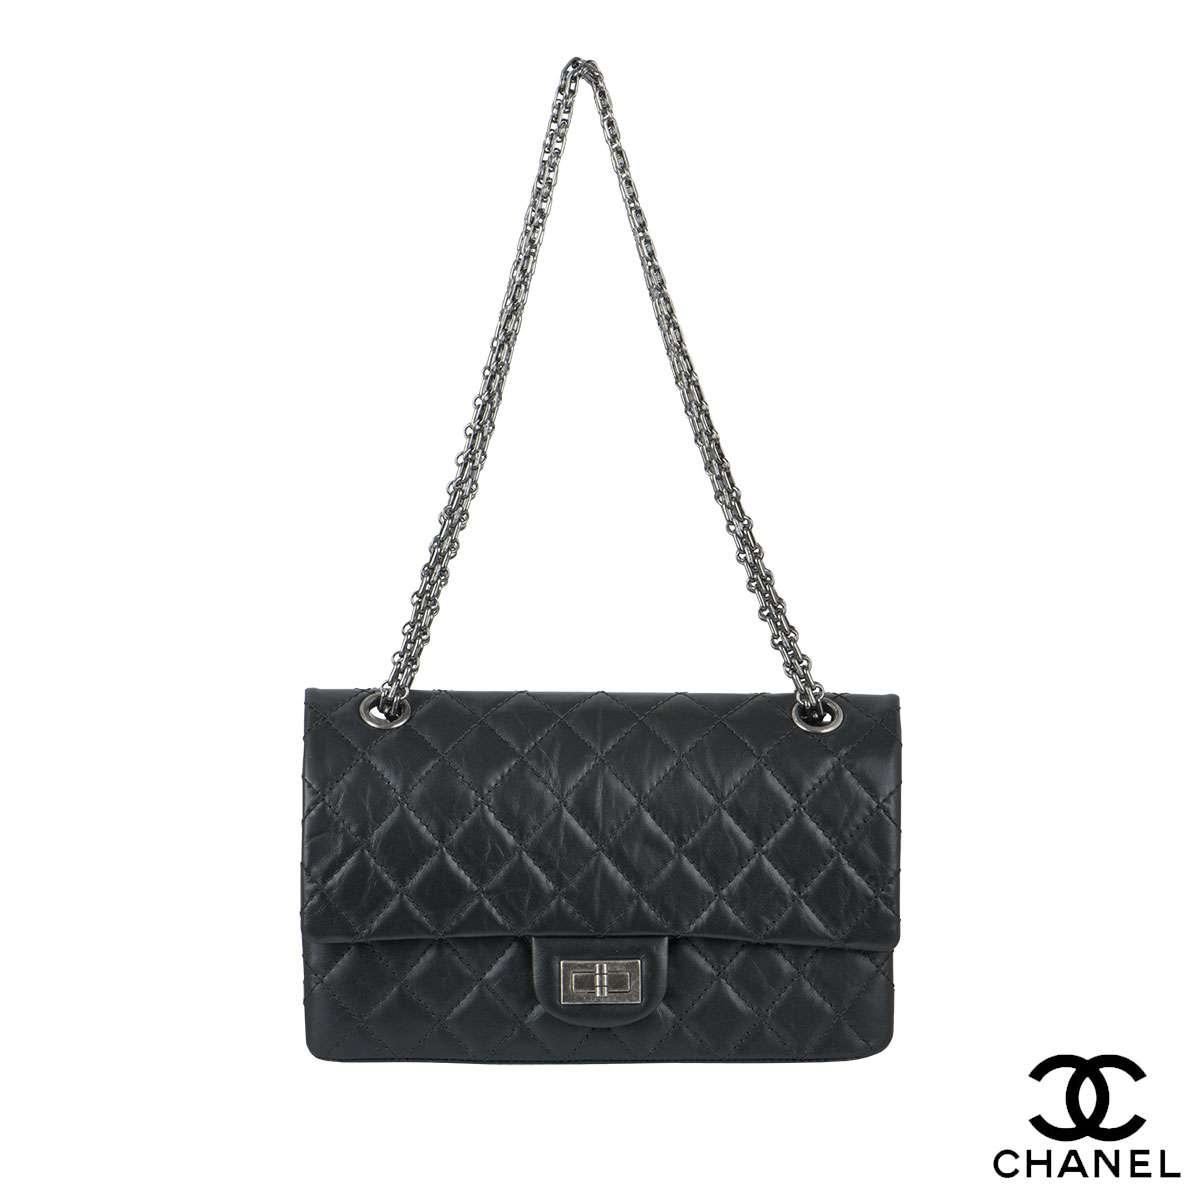 Chanel  2.55 Reissue Double flap 226 Handbag